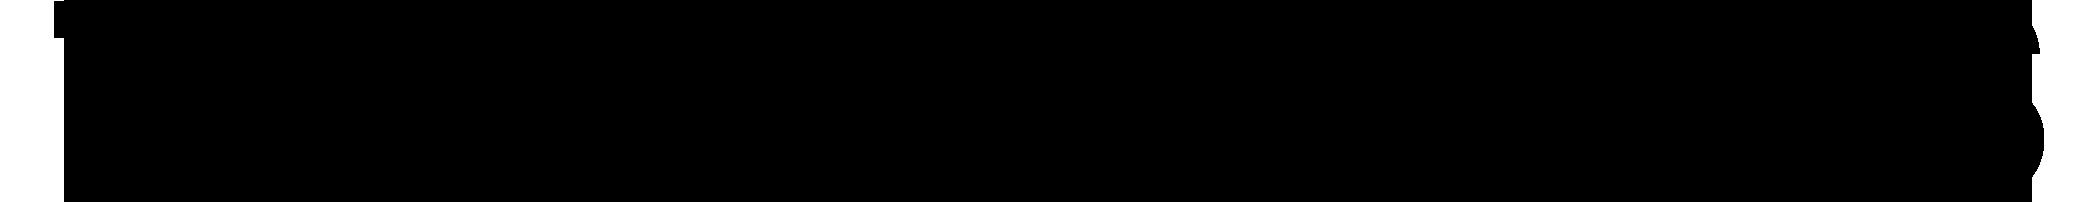 Tiffsandmichs